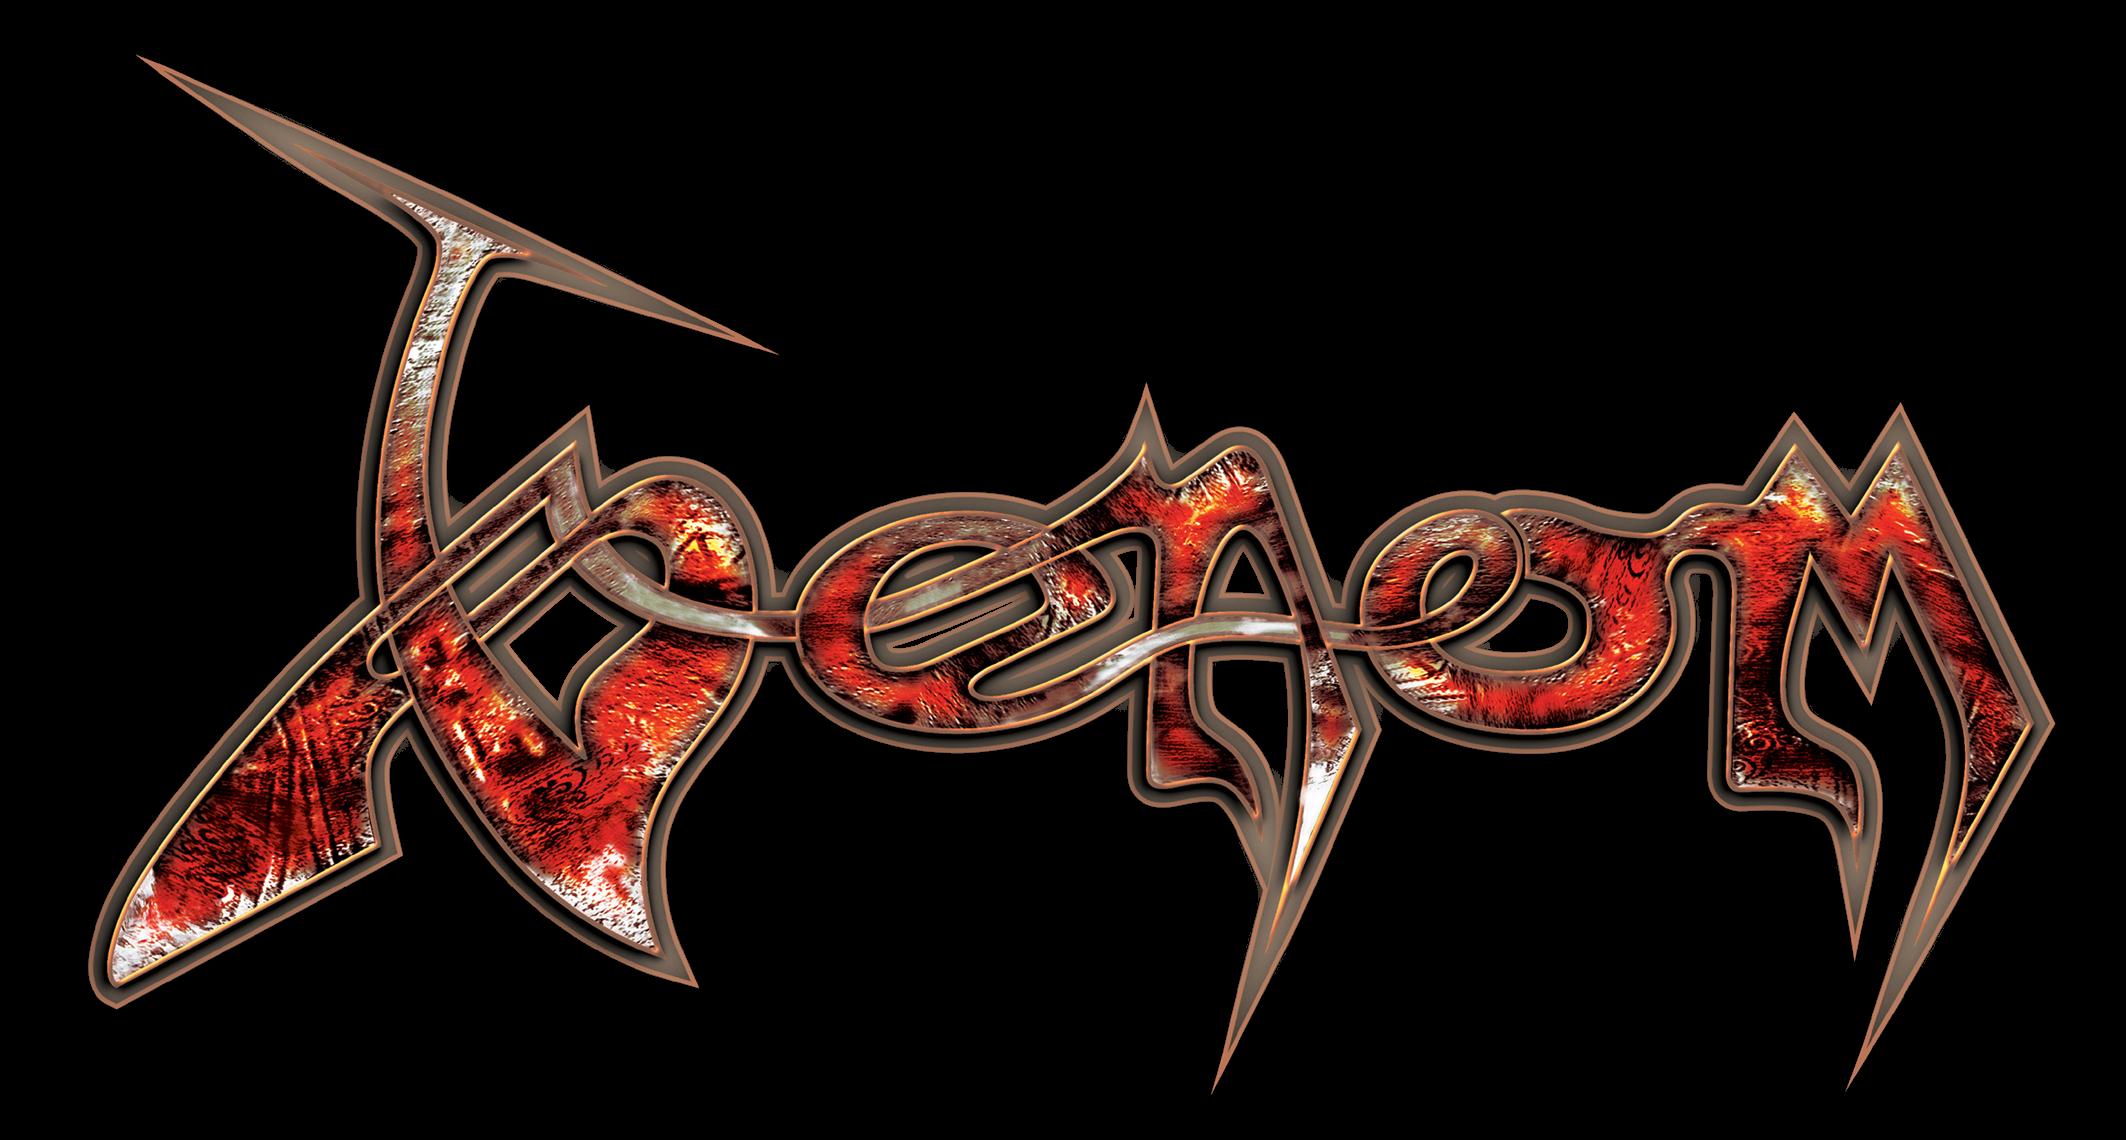 tiedosto venom logo png wikipedia heavy metal logos free heavy metal logos free